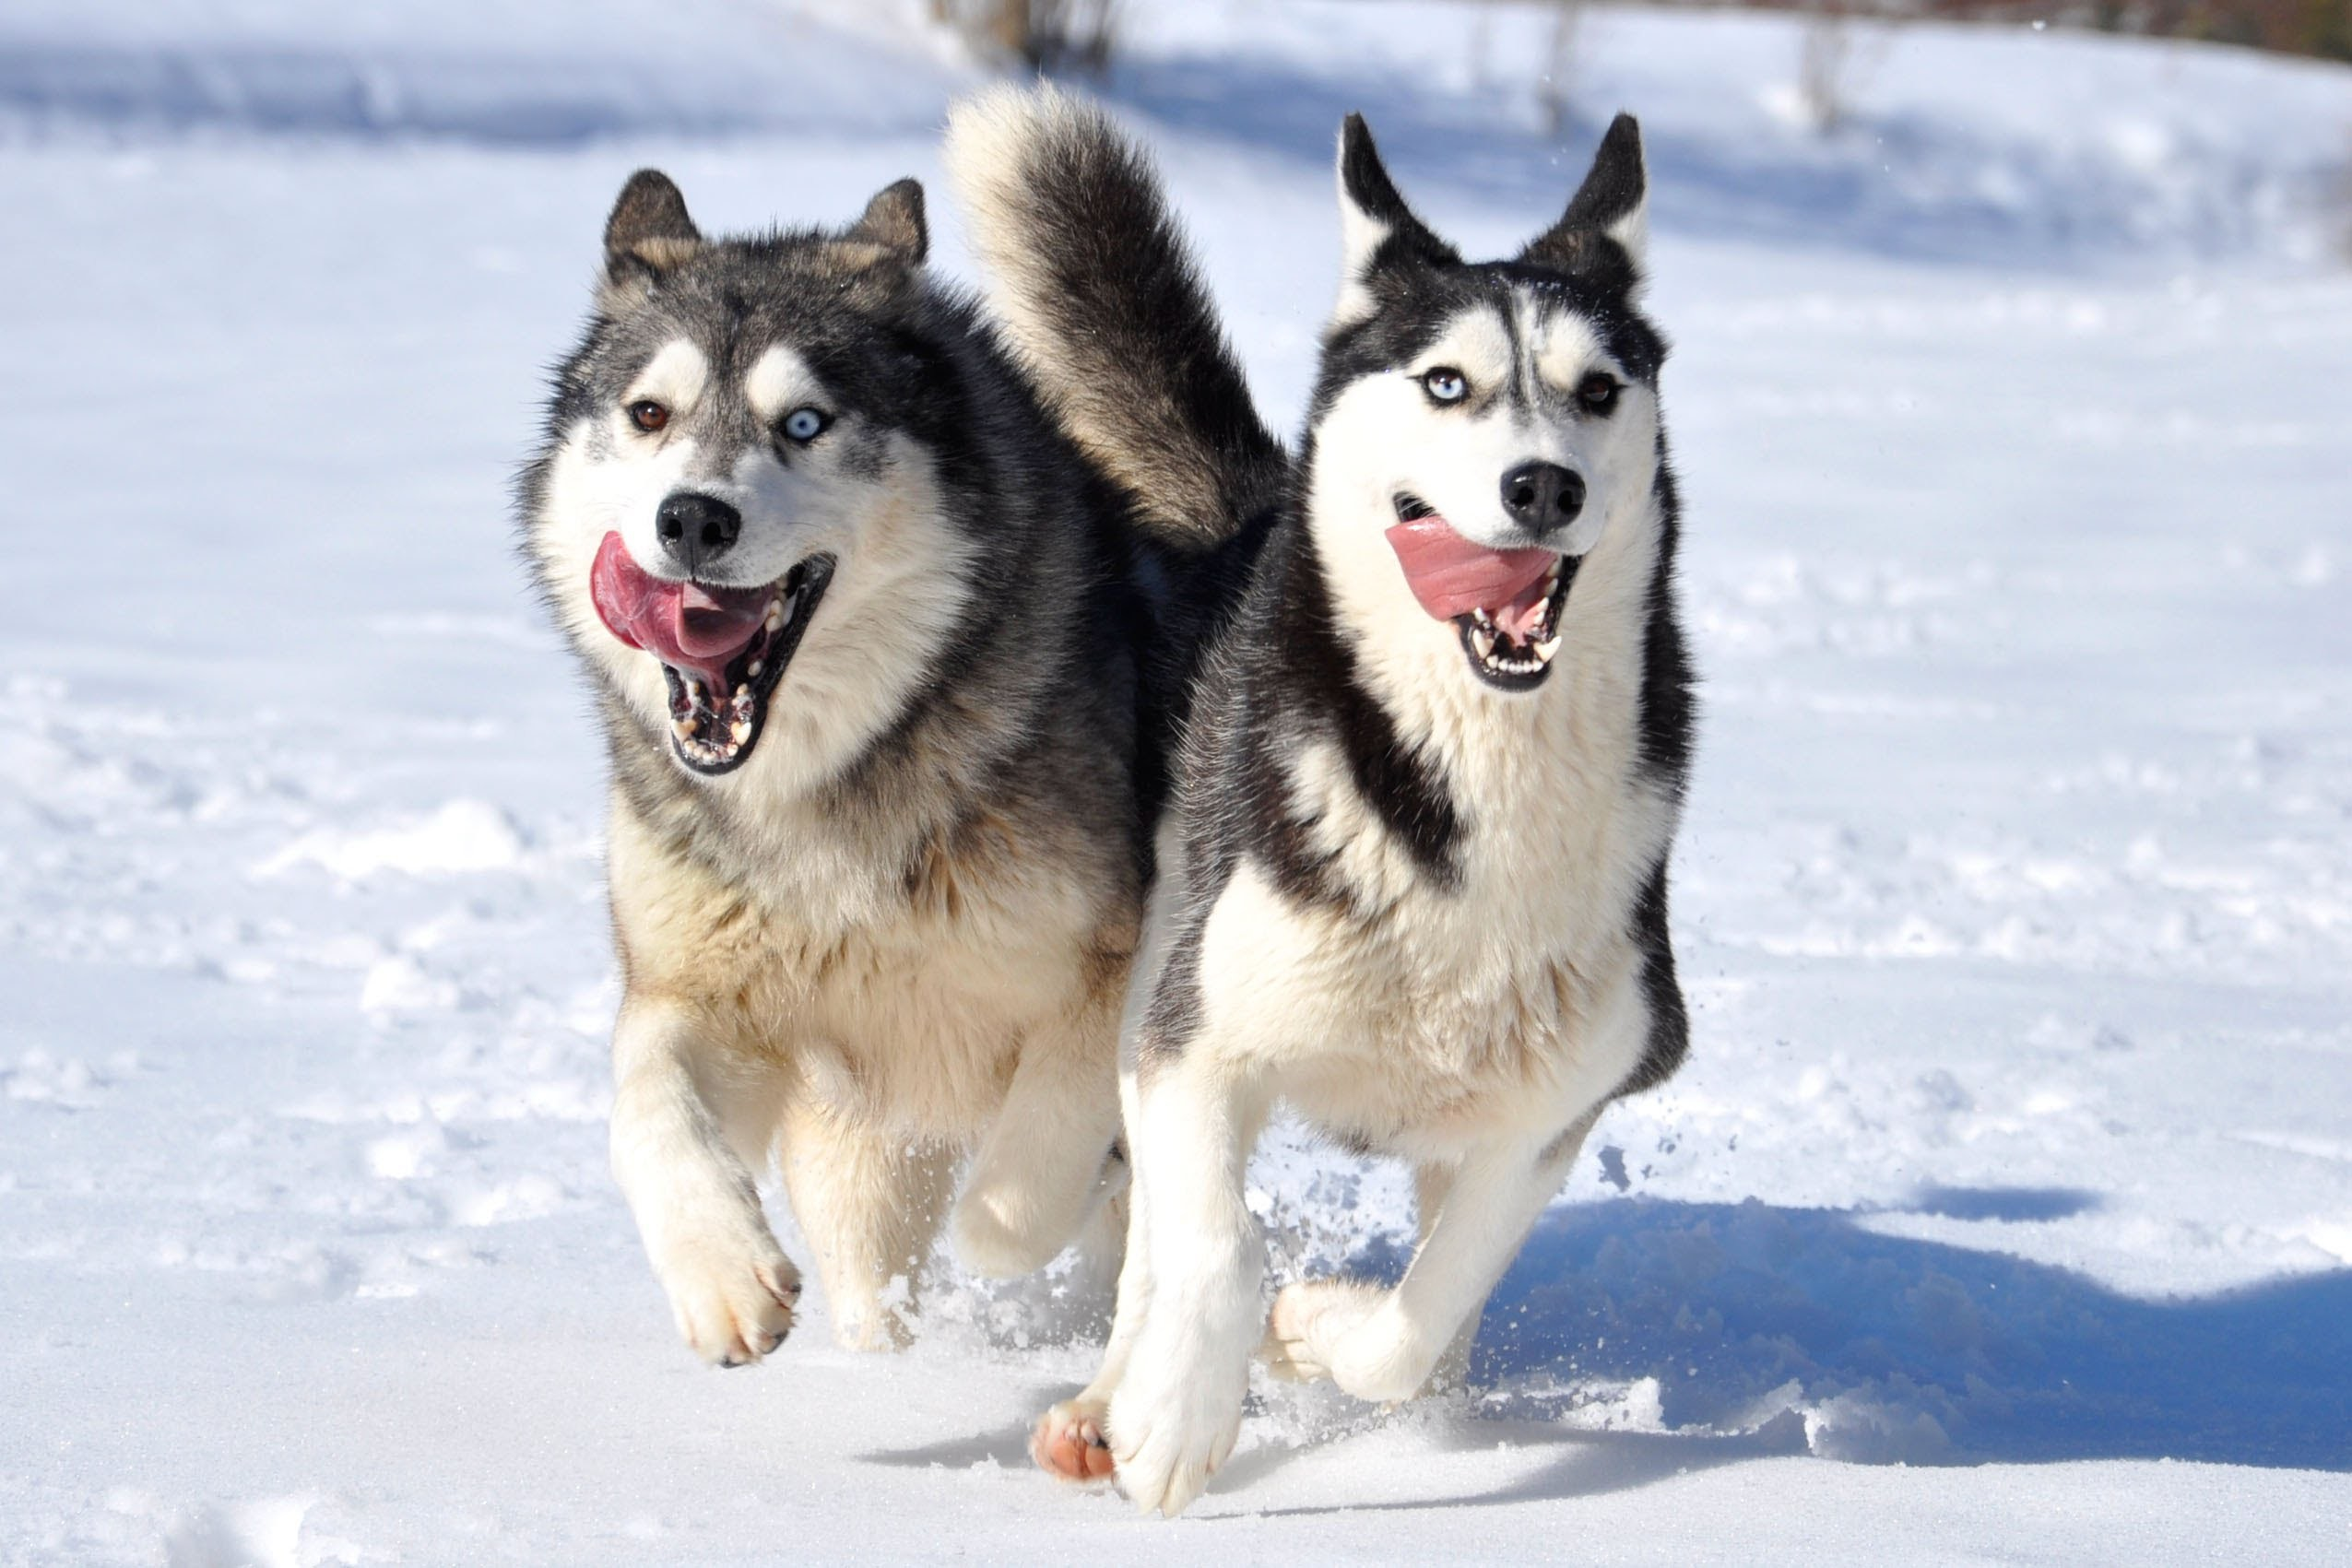 Siberian huskies wallpapers 86 images - Pictures of siberian huskies ...